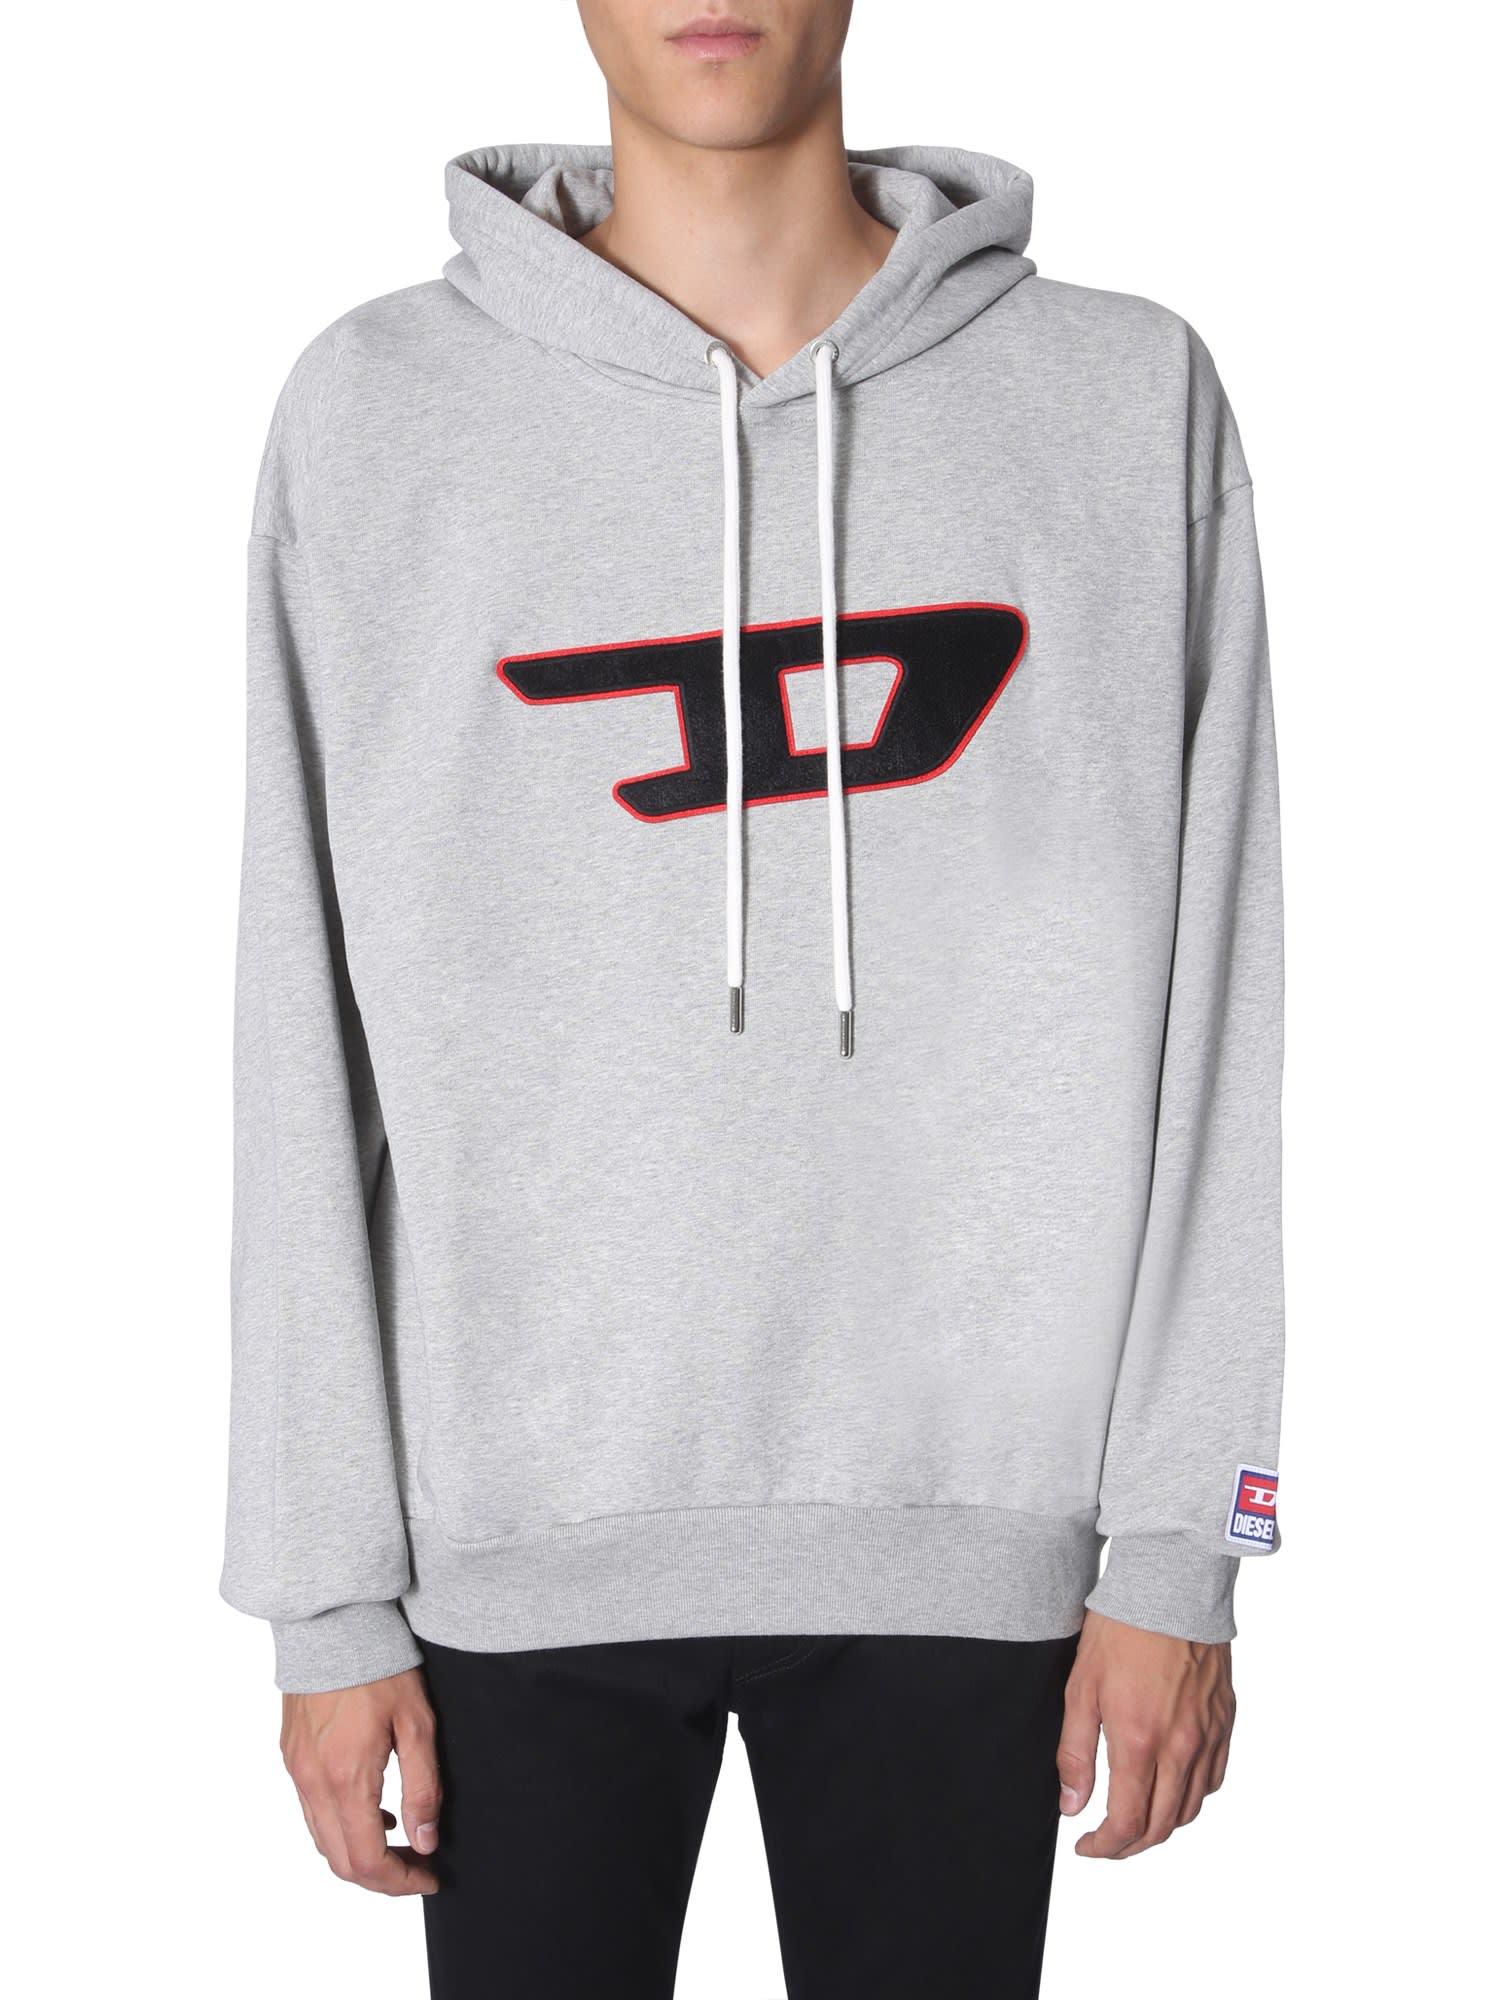 Diesel S-division-d Sweater